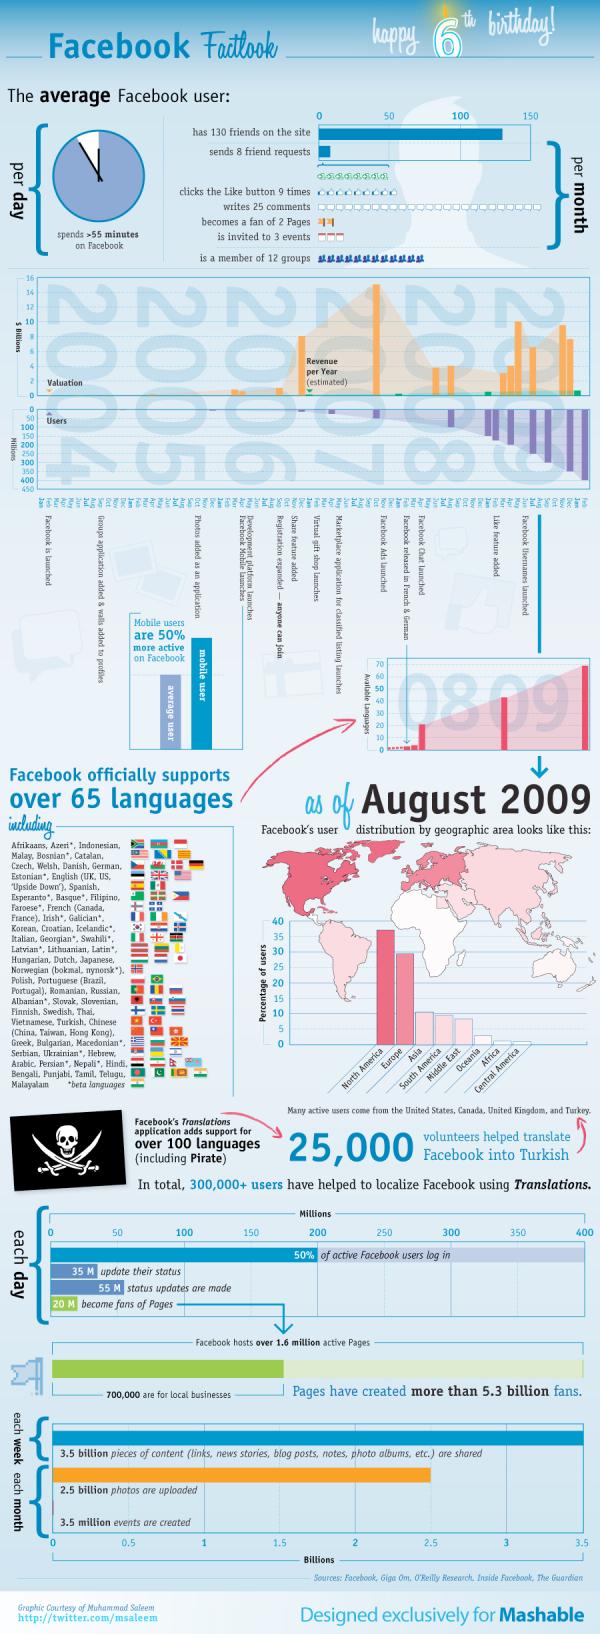 The Ultimate List: 300+ Social Media Statistics